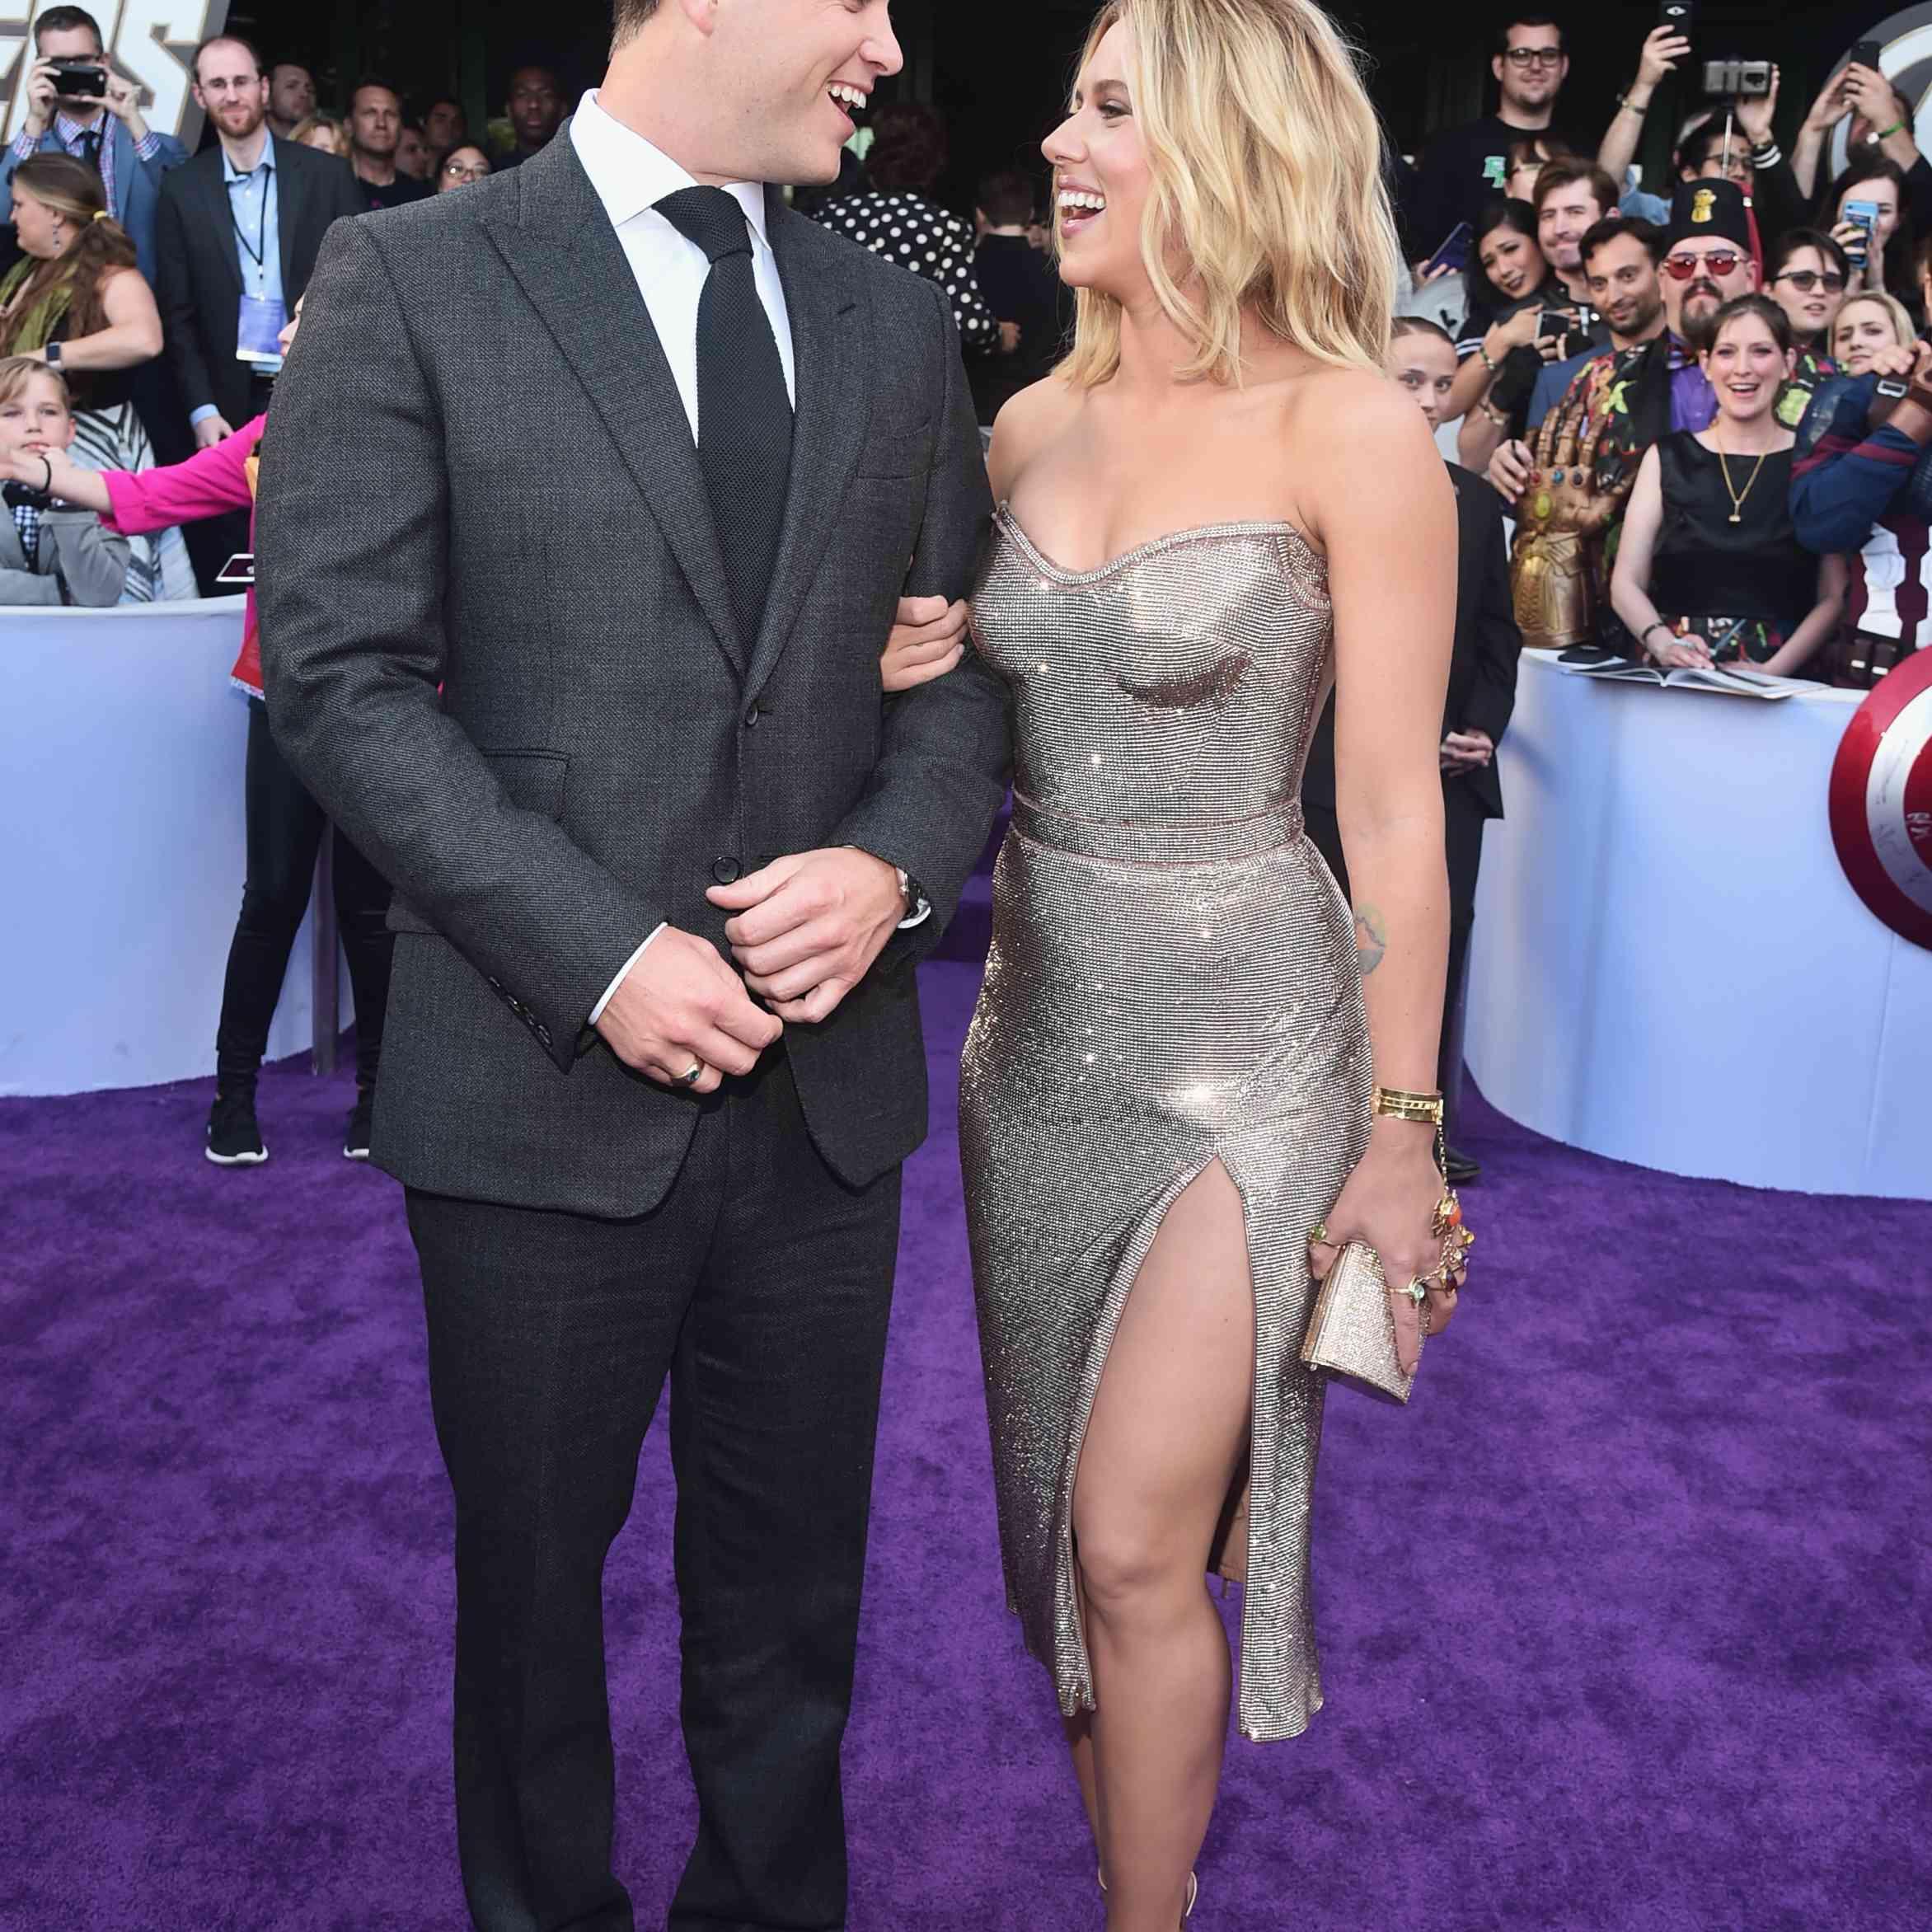 Colin Jost and Scarlett Johansson Avengers End Game